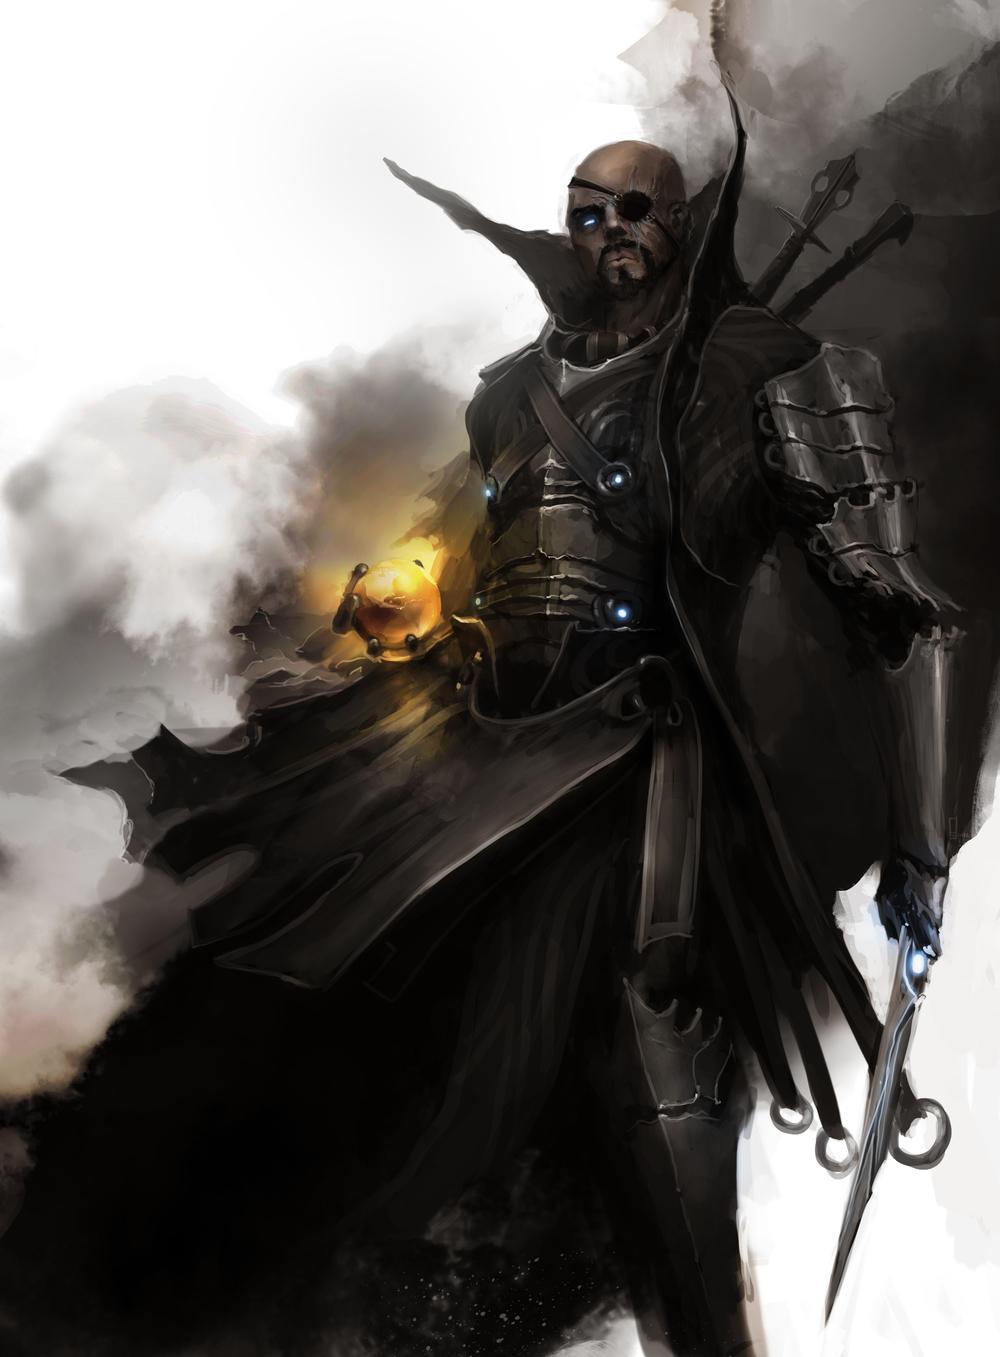 the_avengers___nick_fury_by_thedurrrrian-d551qvz.jpg